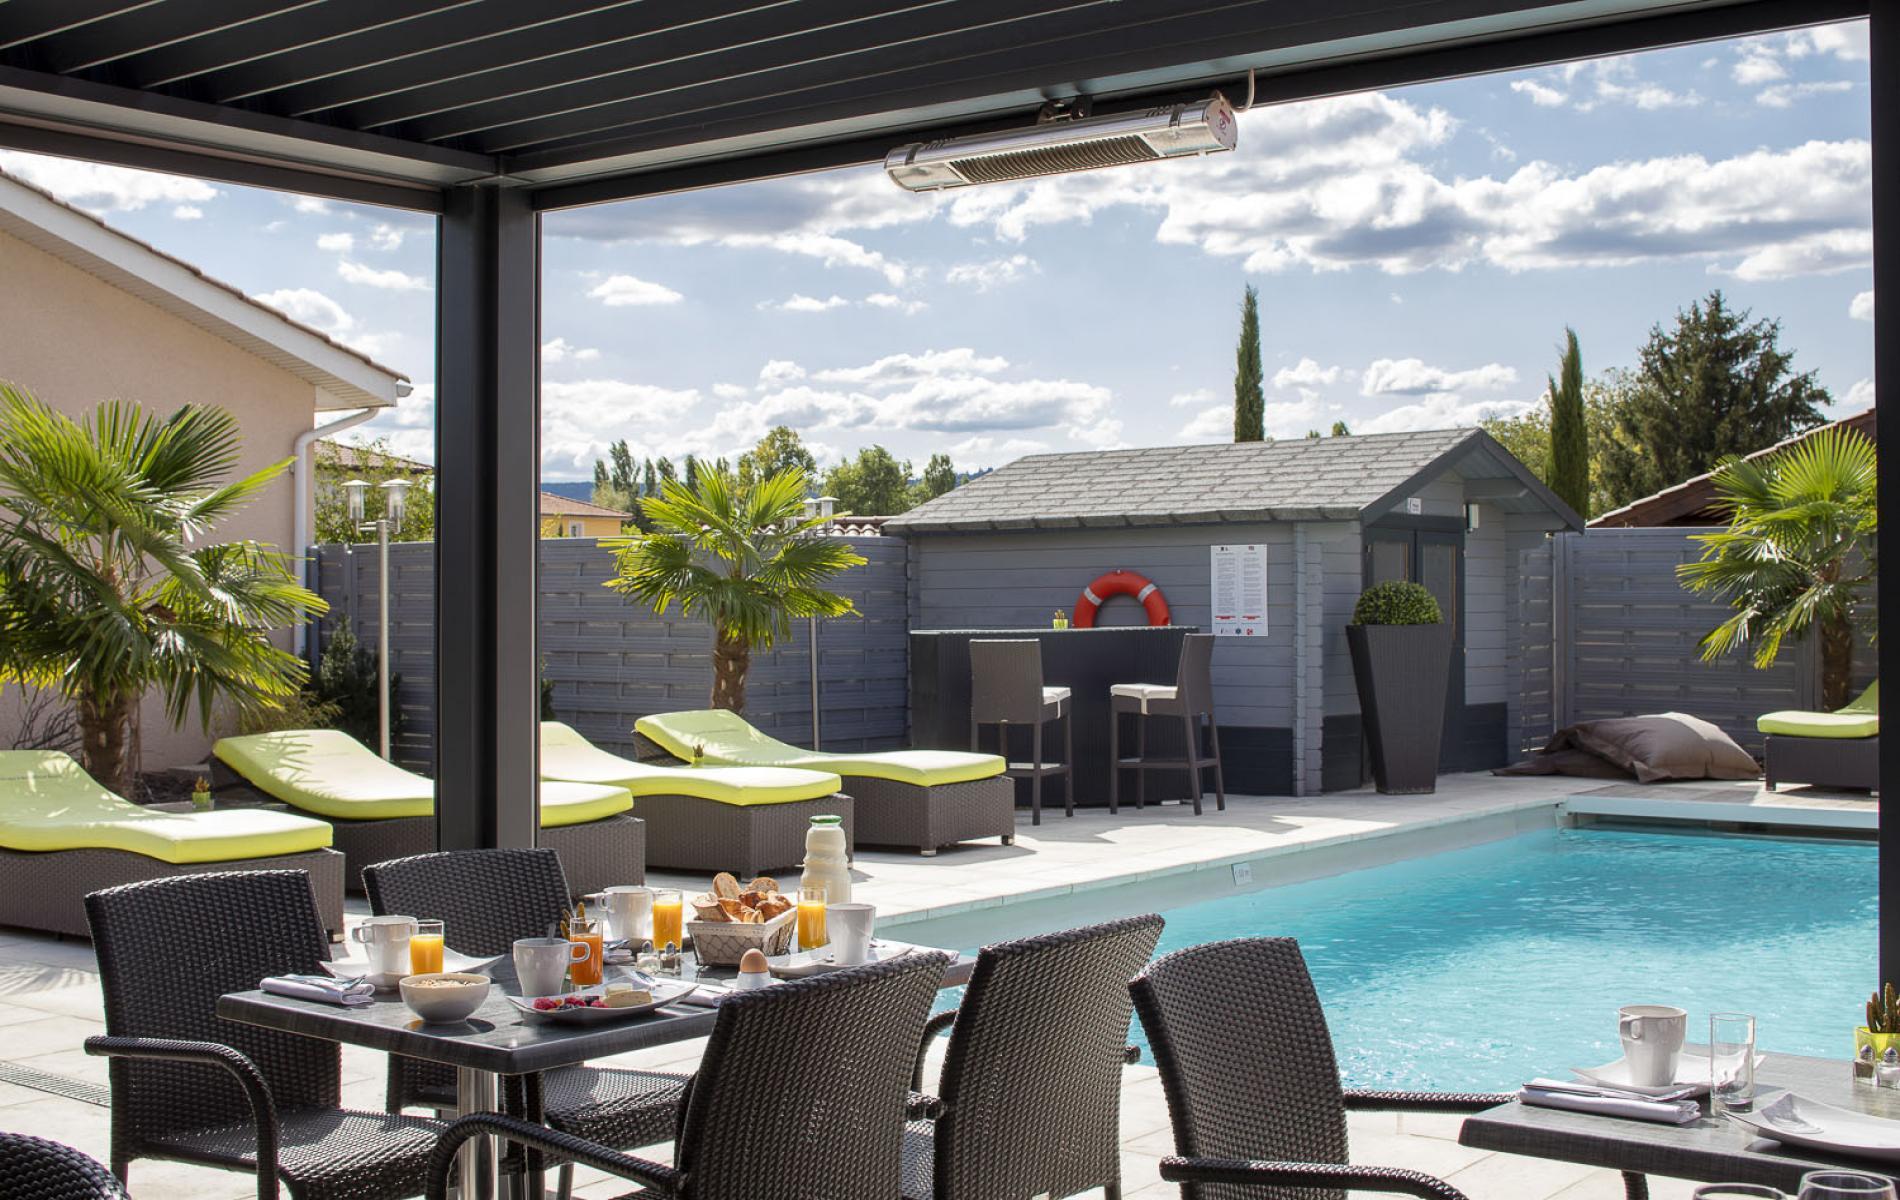 ∞Les Pierres Dorées, Hotel With Pool Near Lyon